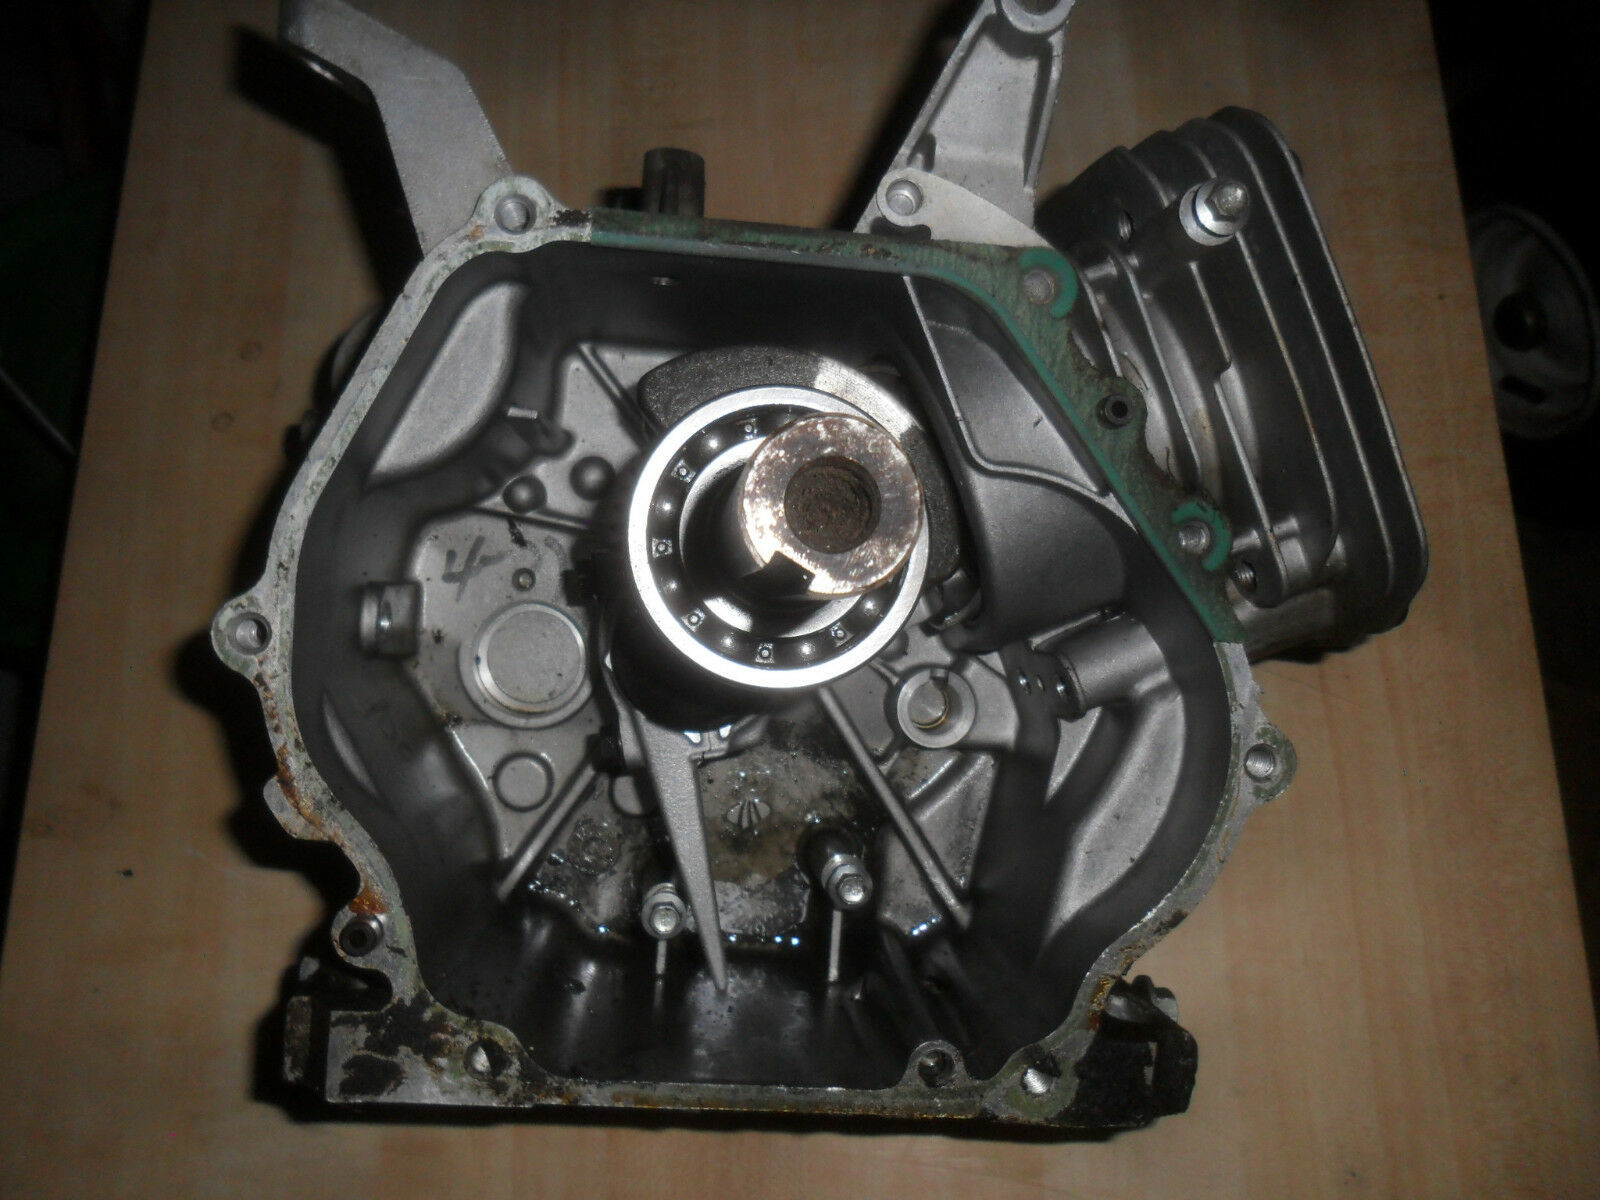 HONDA GX270 CRANKCASE CRANKSHAFT PISTON, ROD CYINDER JIANGSU QA2 BLOWER MOTOR - $40.00